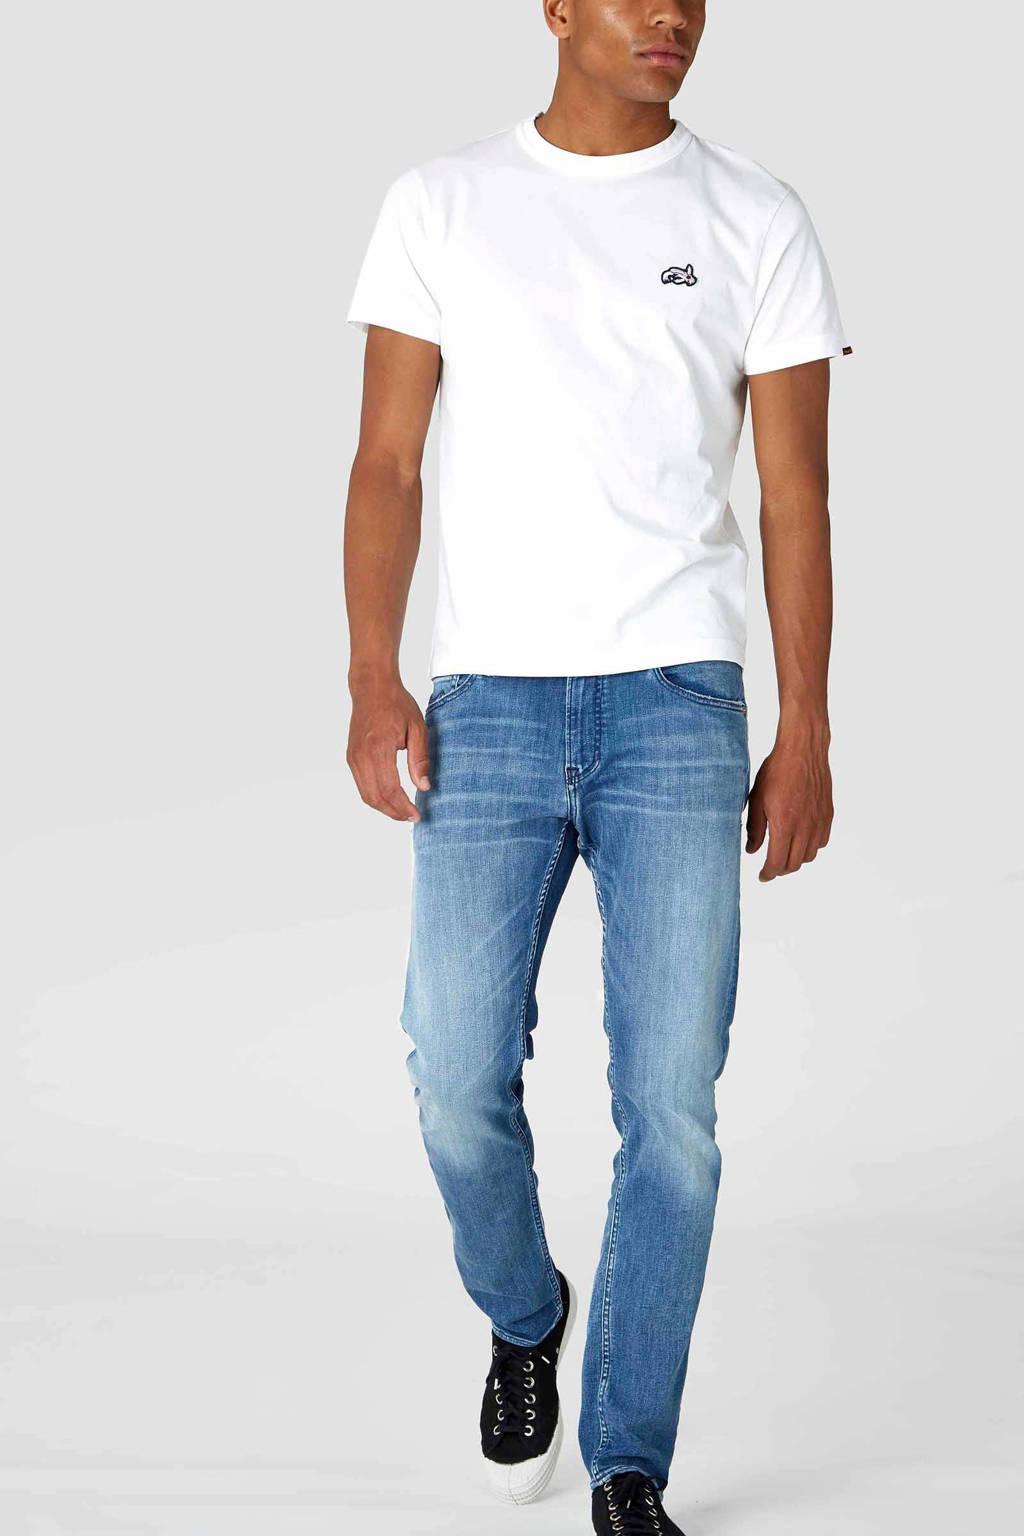 Kings of Indigo slim fit jeans Charles myle worn, 4049 Myla Worn In